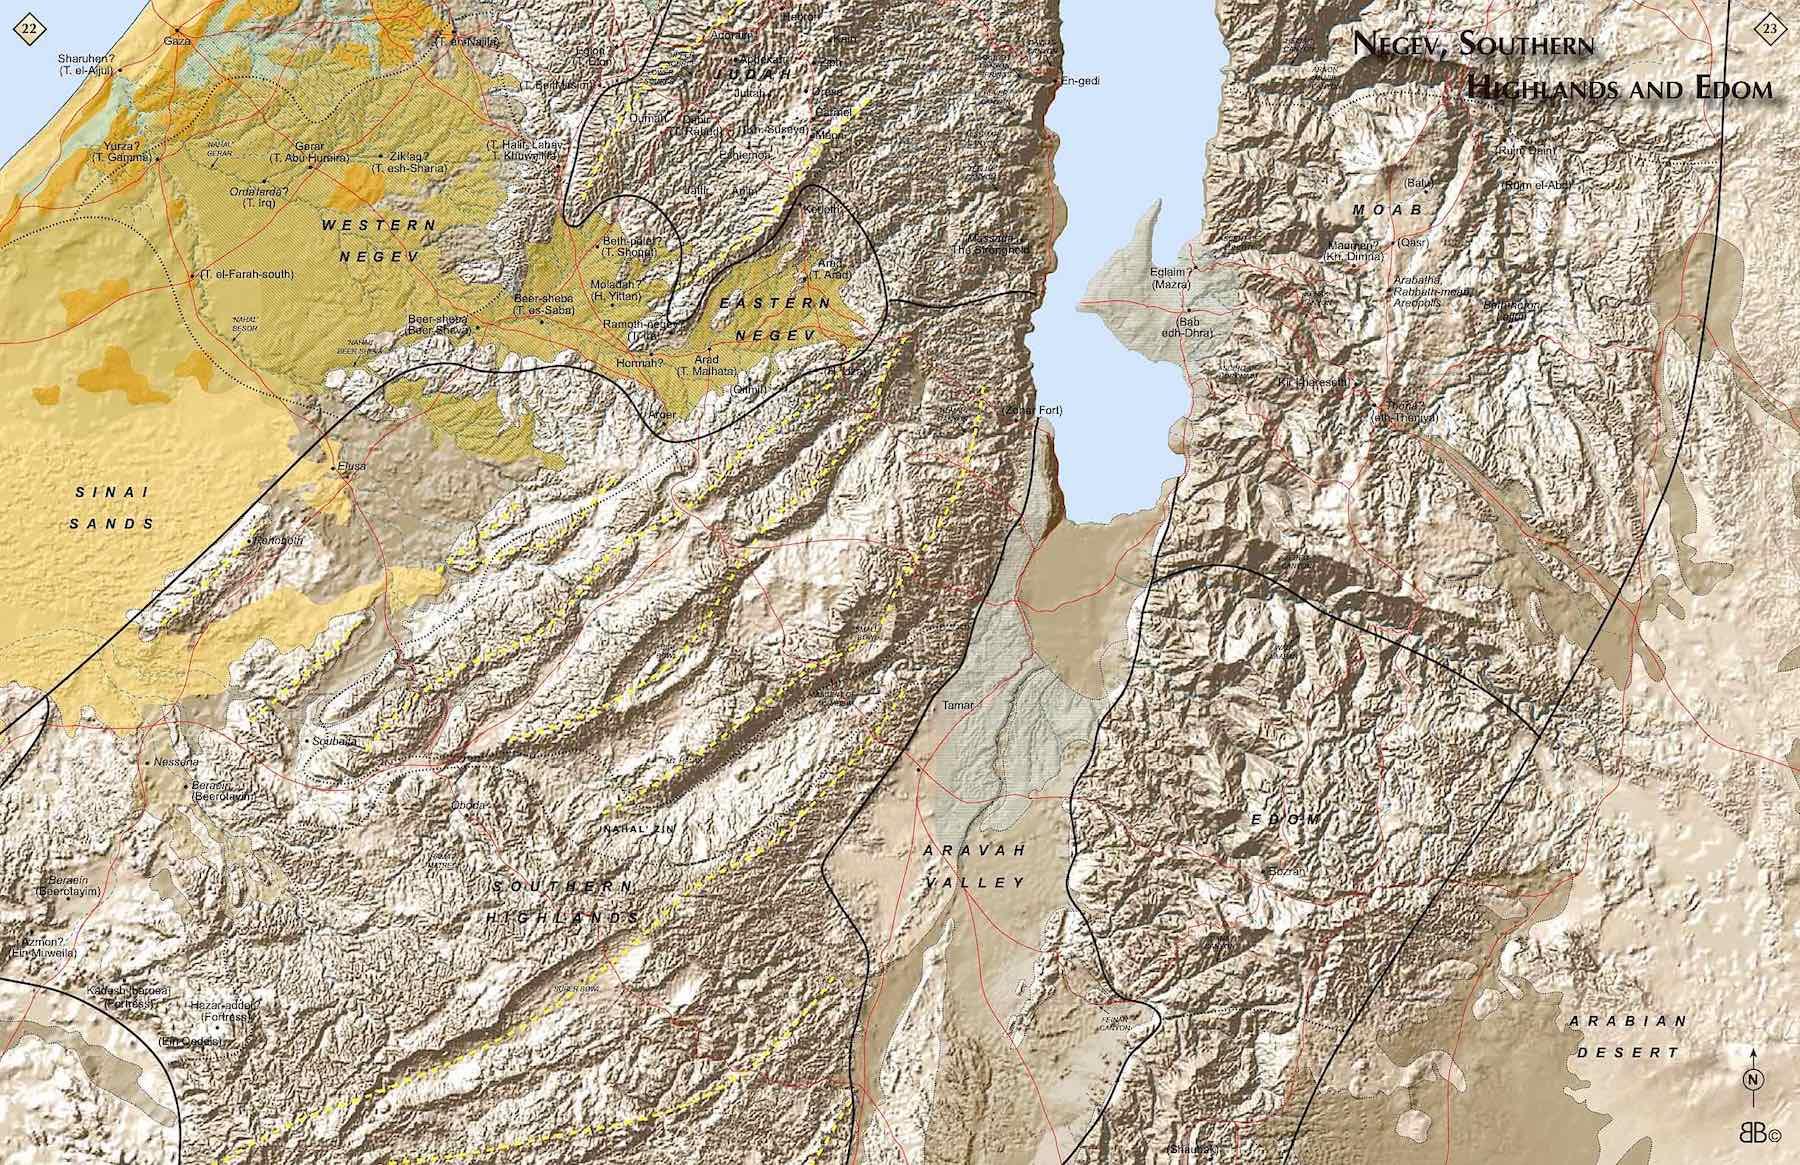 22-23 Negev,SouthernHighlands,Edom